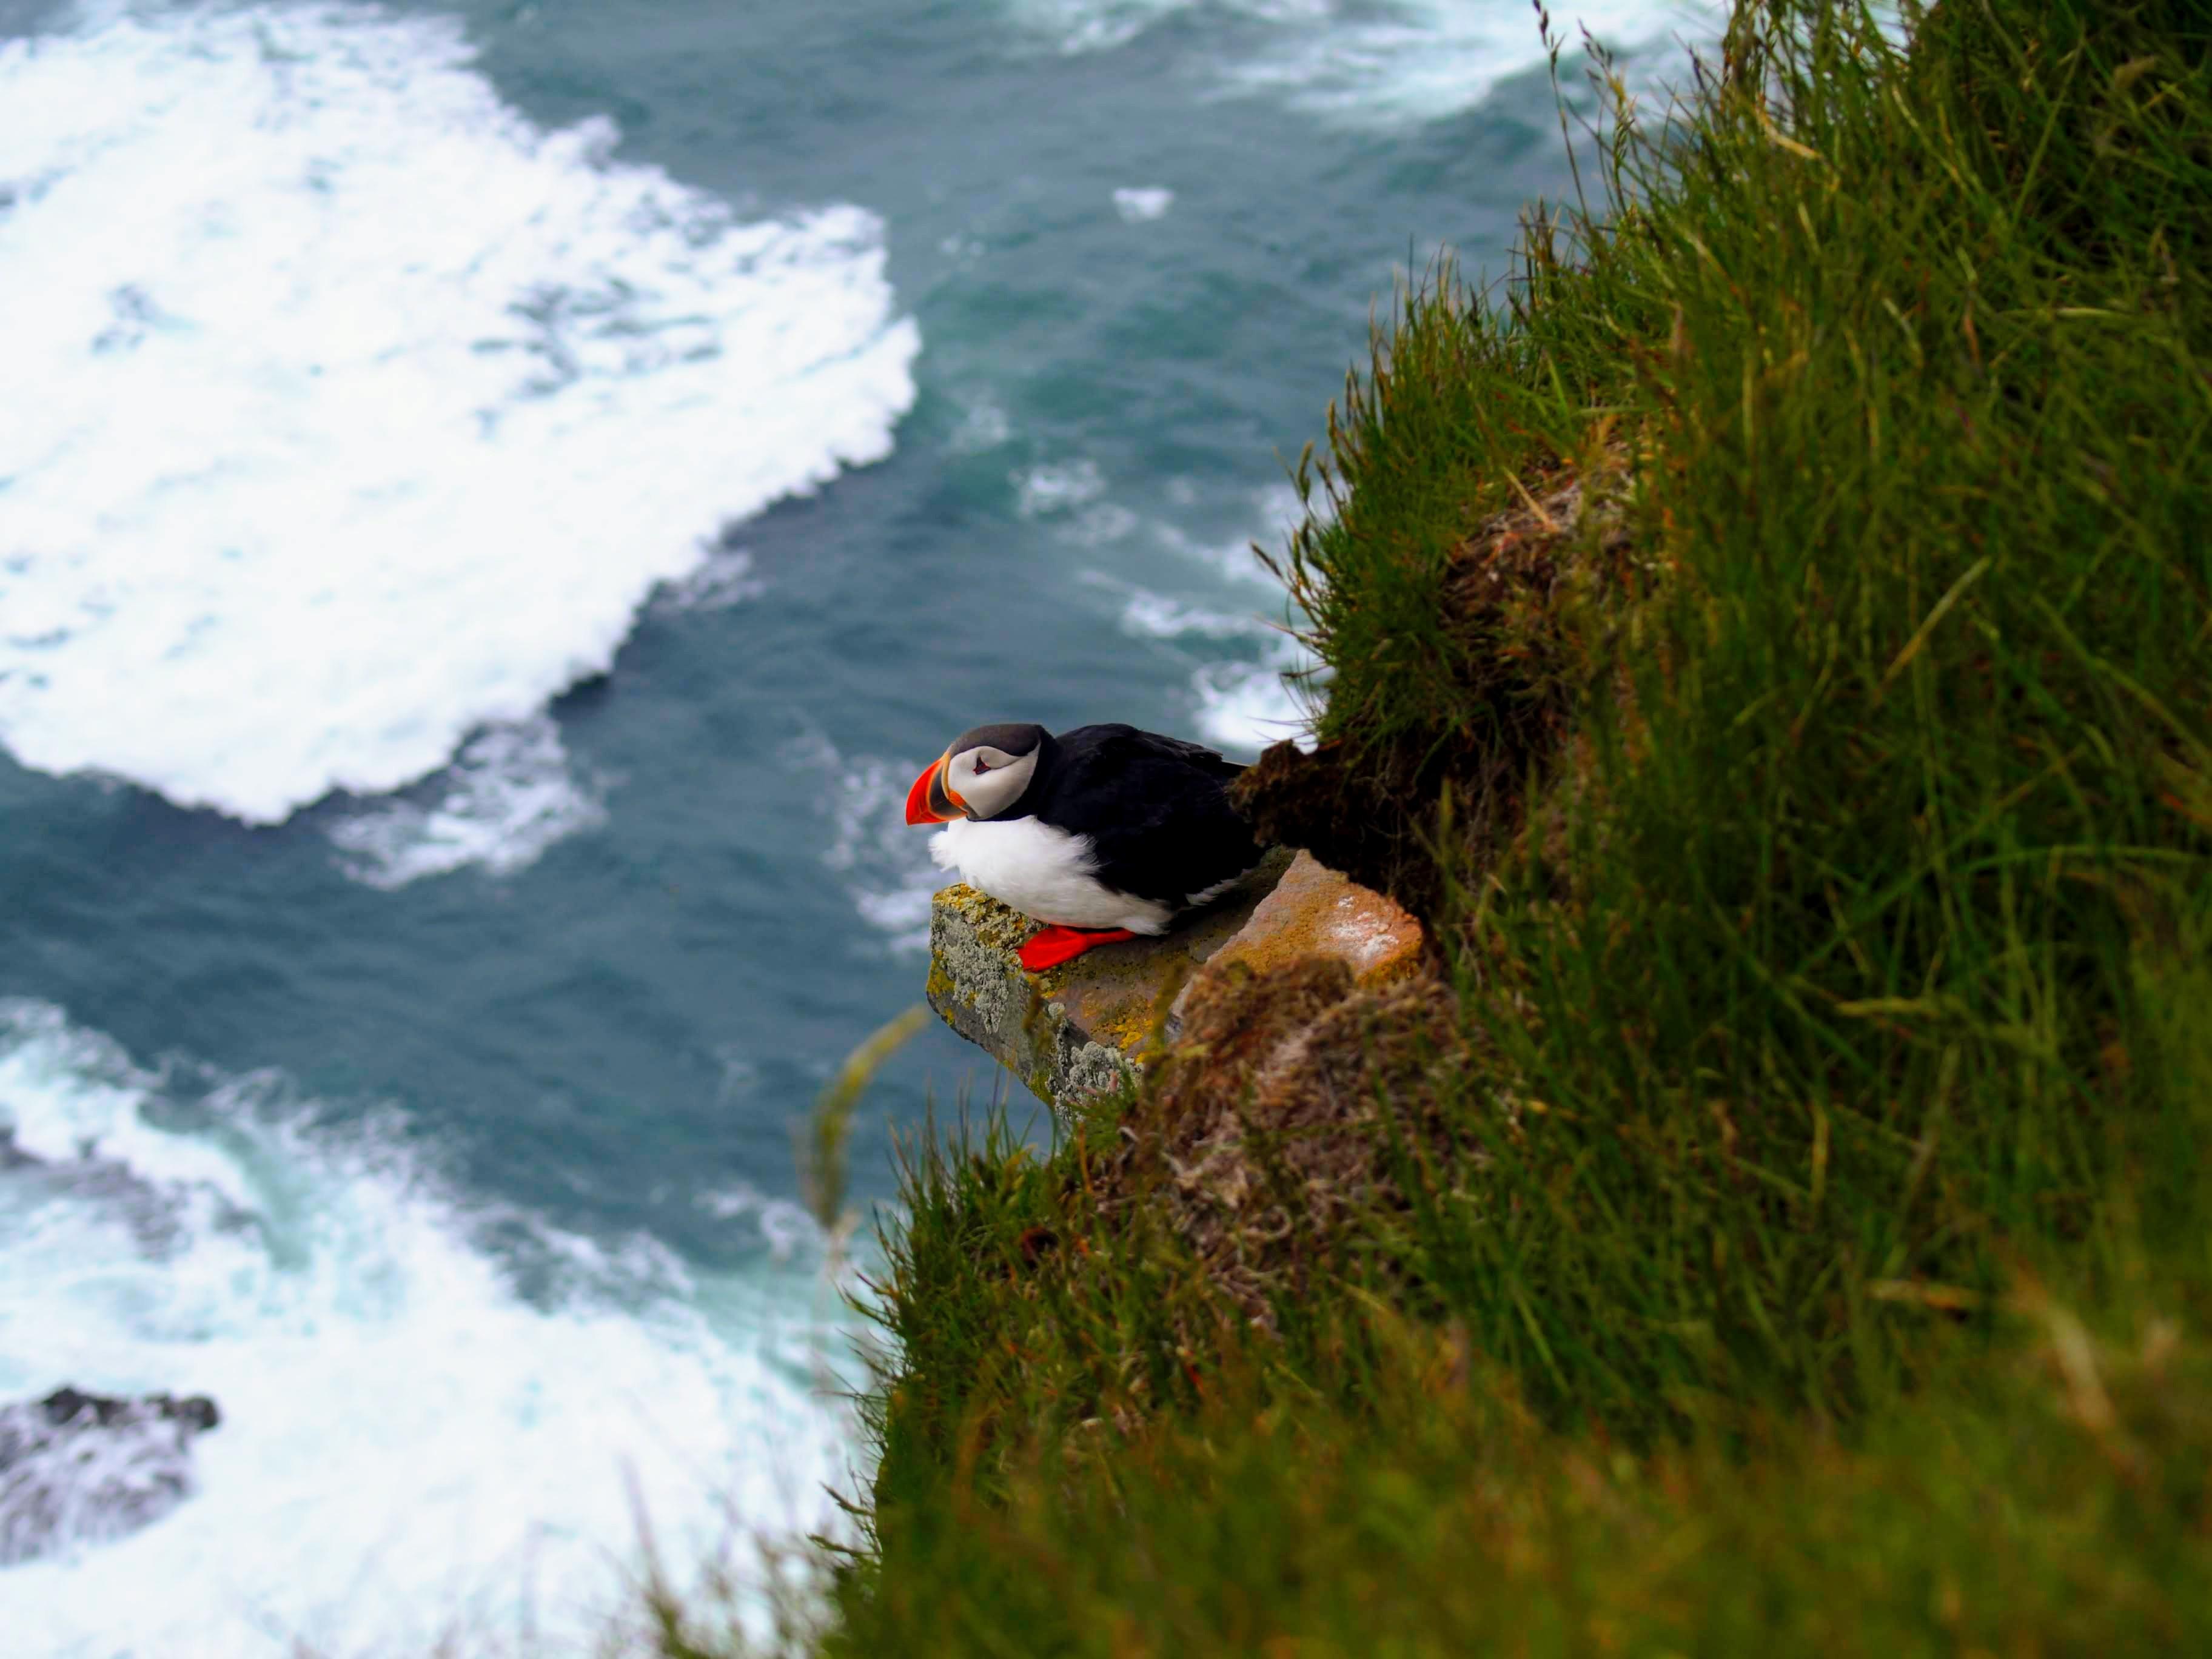 Papuchalk na útesu Latrabjarg